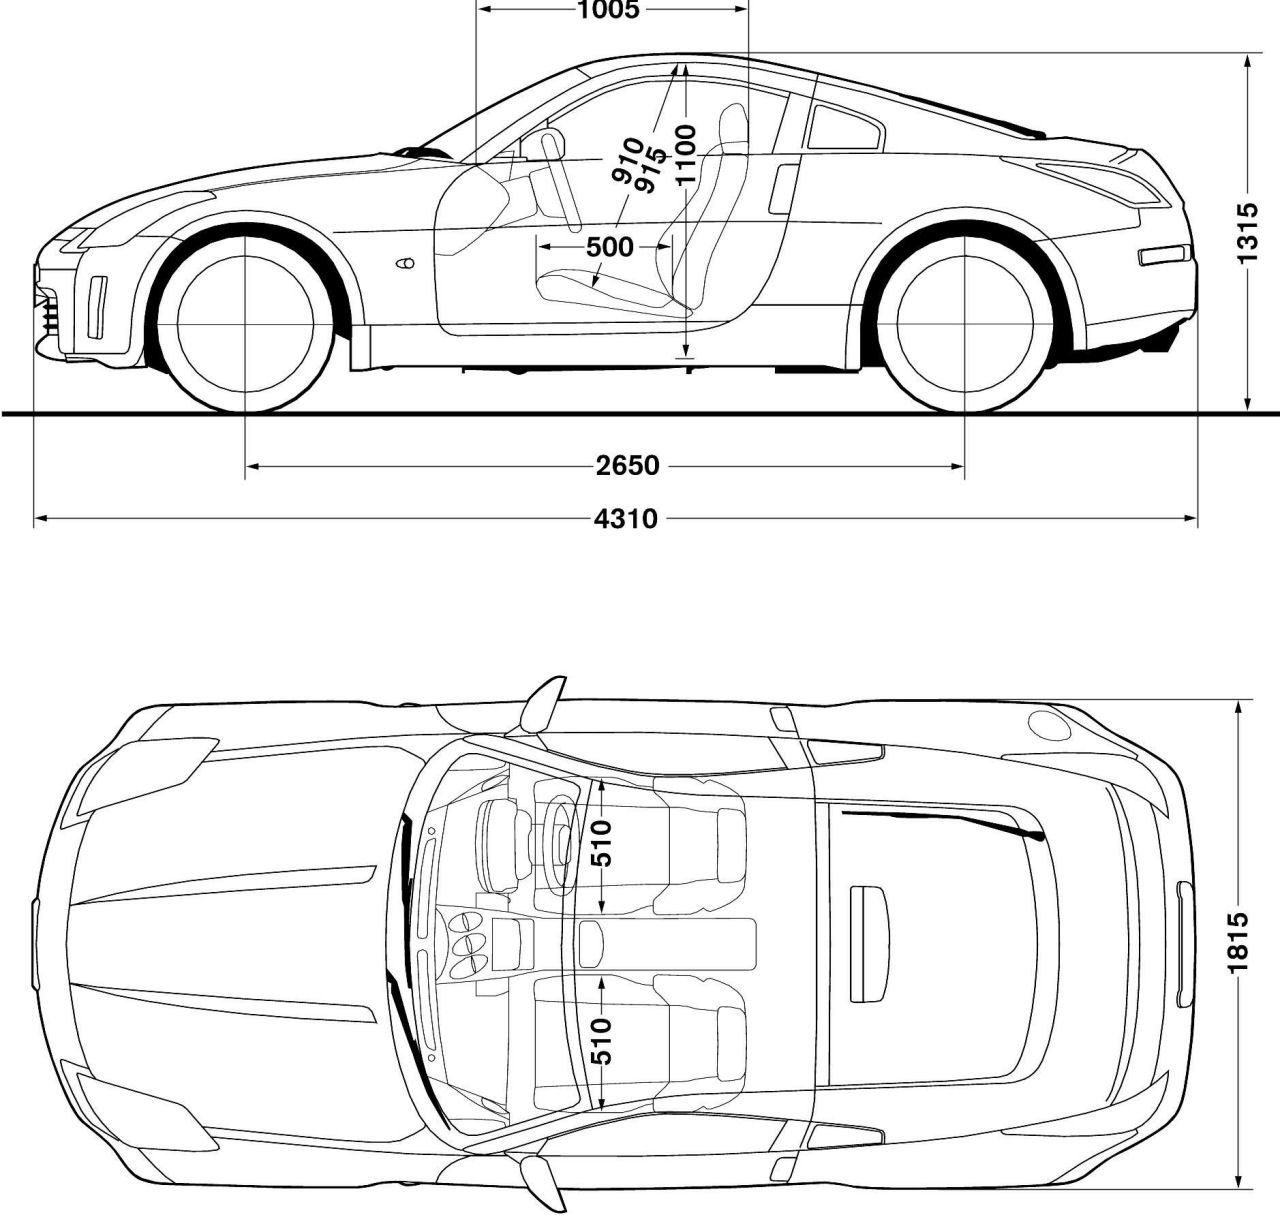 Nissan 350Z blueprint | Auto | Pinterest | Nissan 350Z, Nissan and Cars